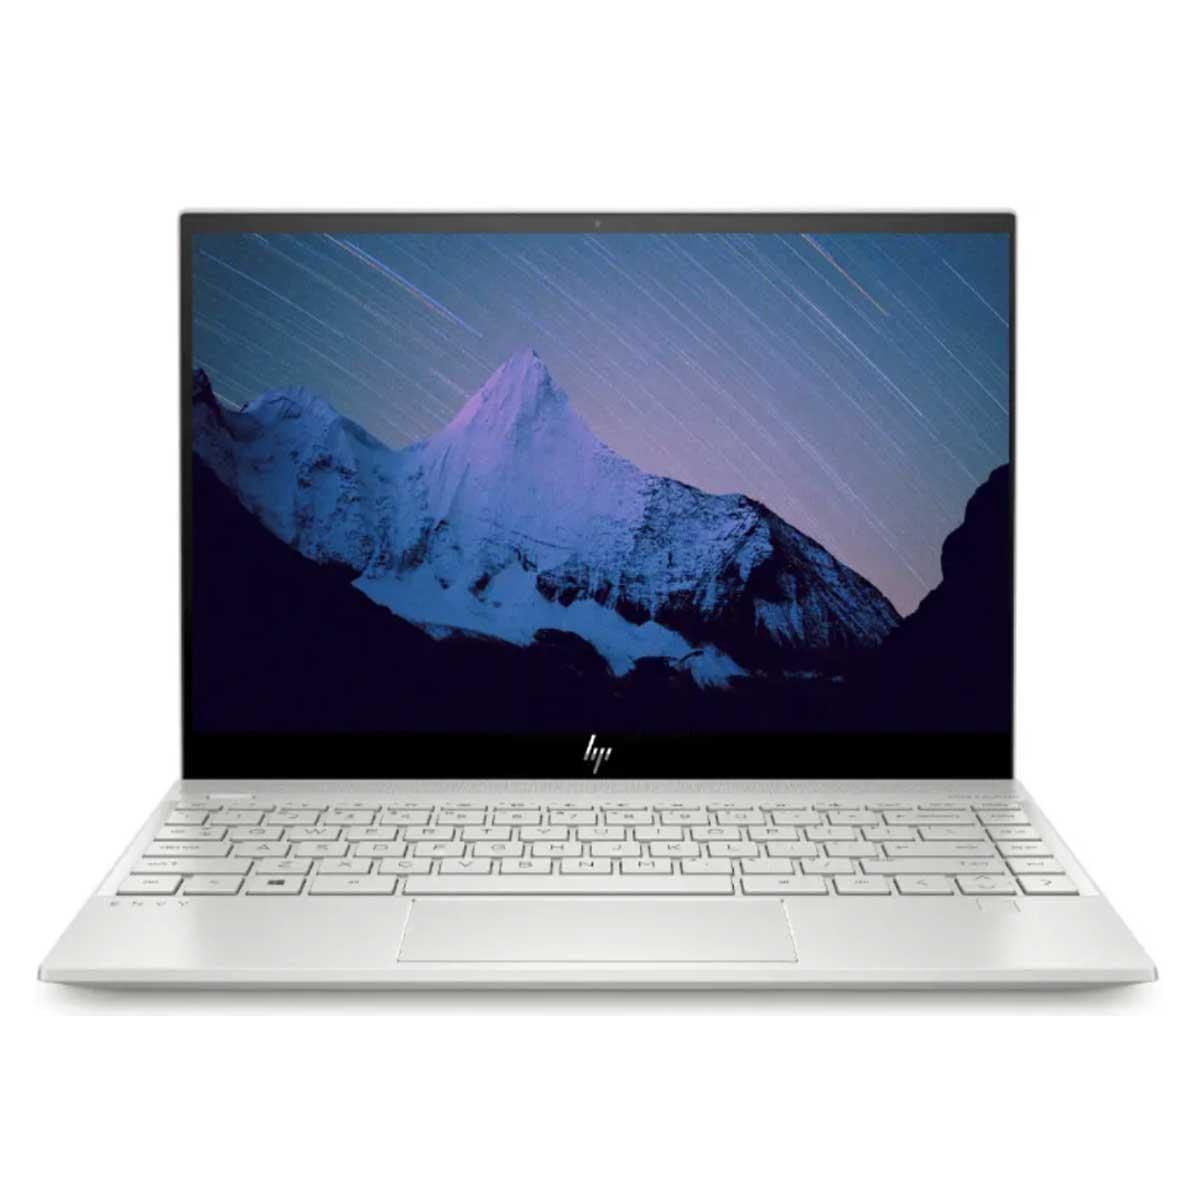 hp laptop price in india